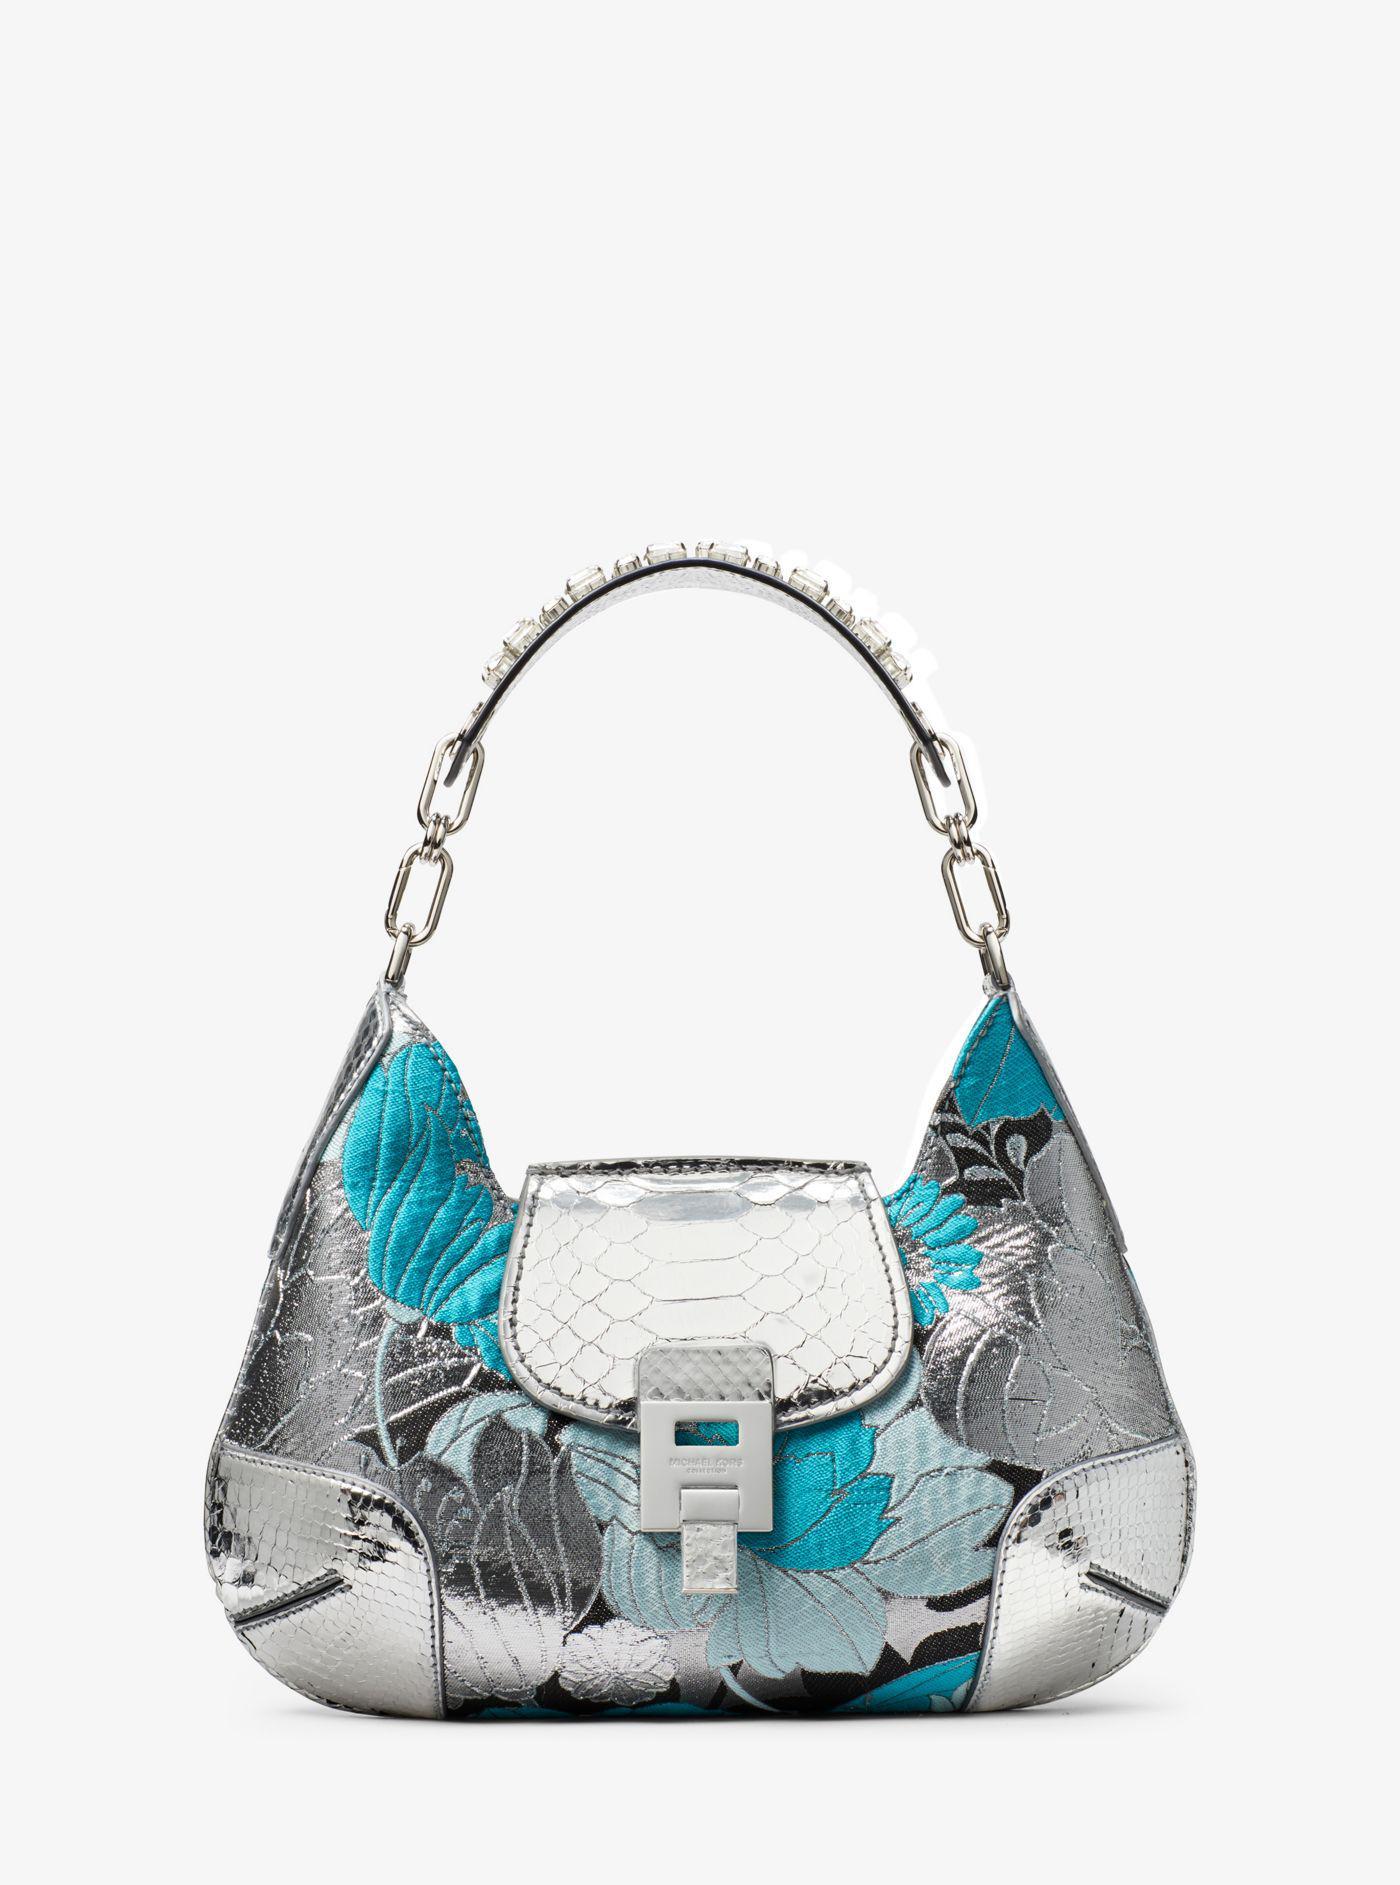 4b658c9c56887 Michael Kors Bancroft Medium Floral Brocade Shoulder Bag in Blue - Lyst